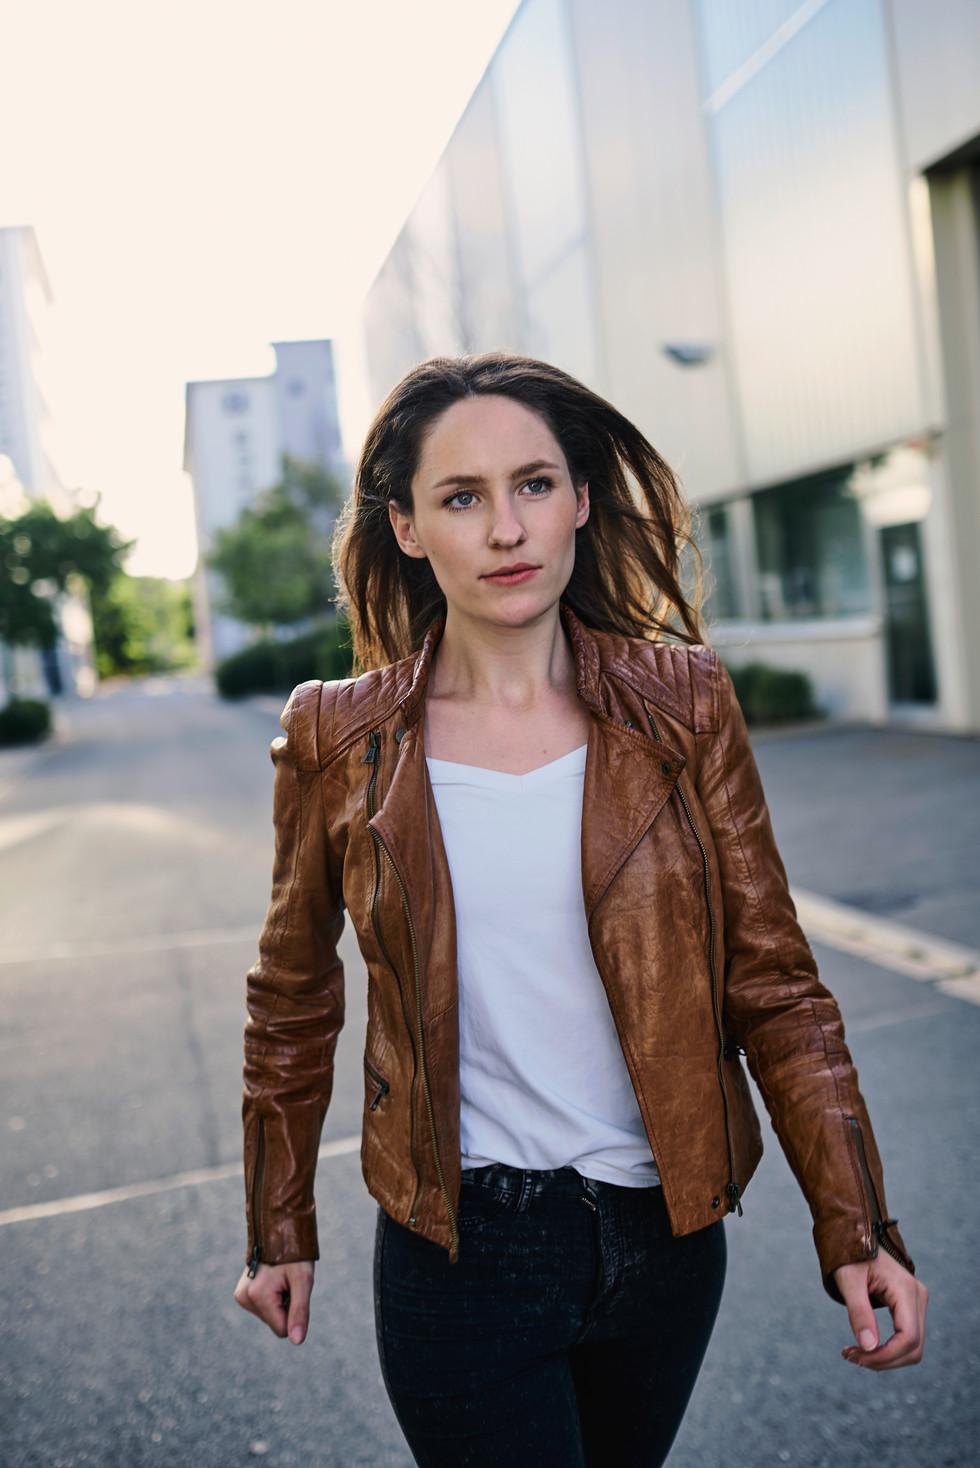 Actress: Miriam Karpf Agency: Bizzybody